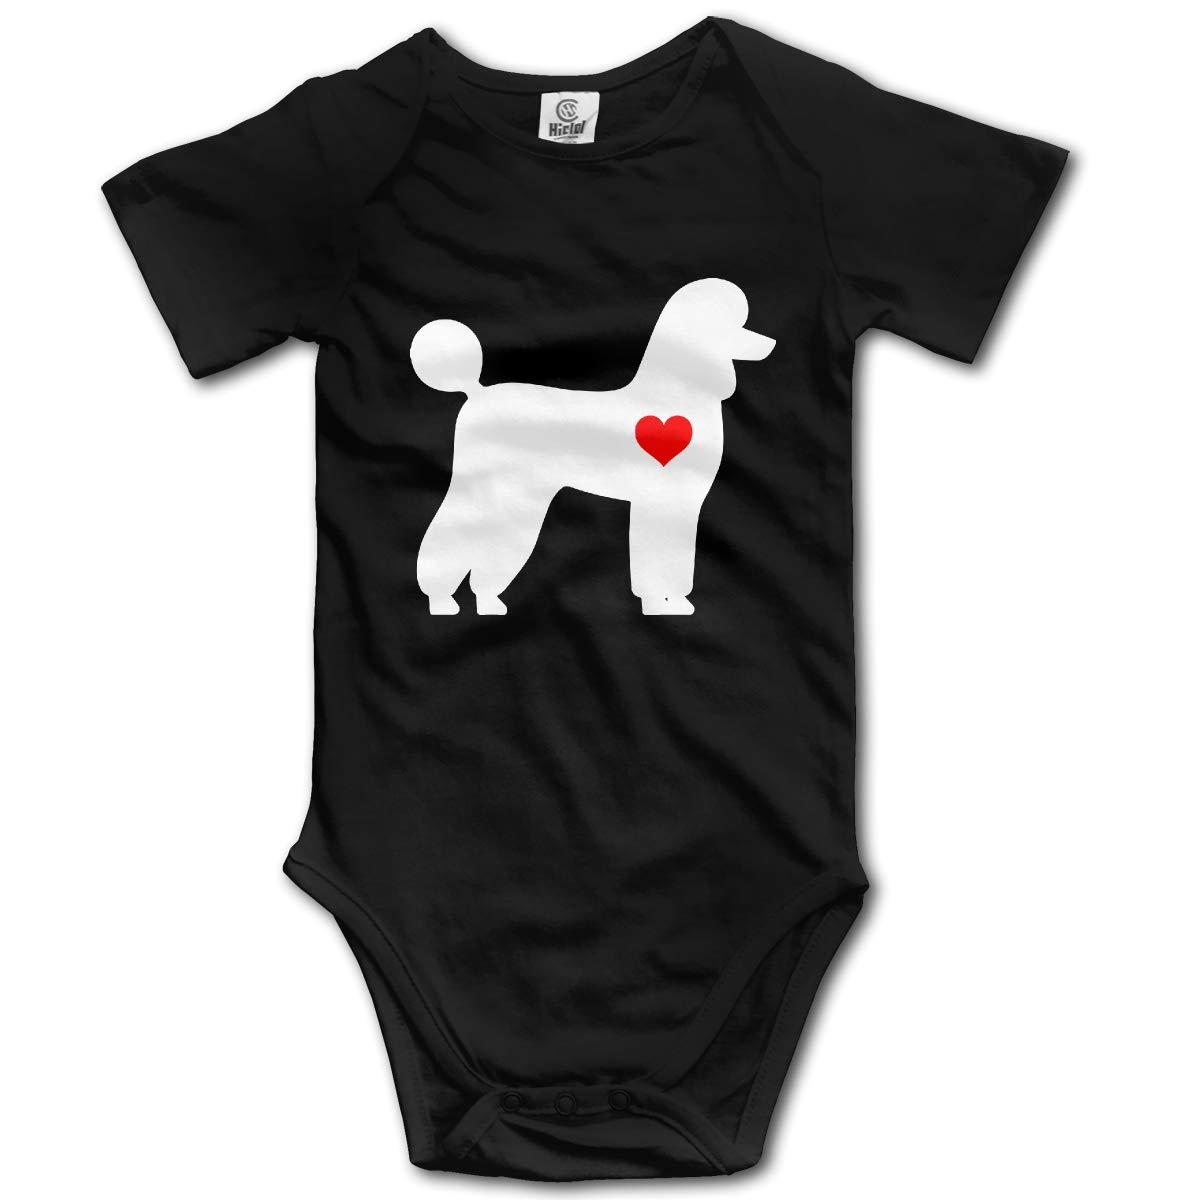 Poodle Dog Heart Newborn Infant Baby Short Sleeve Romper Bodysuit Tops 0-24 Months